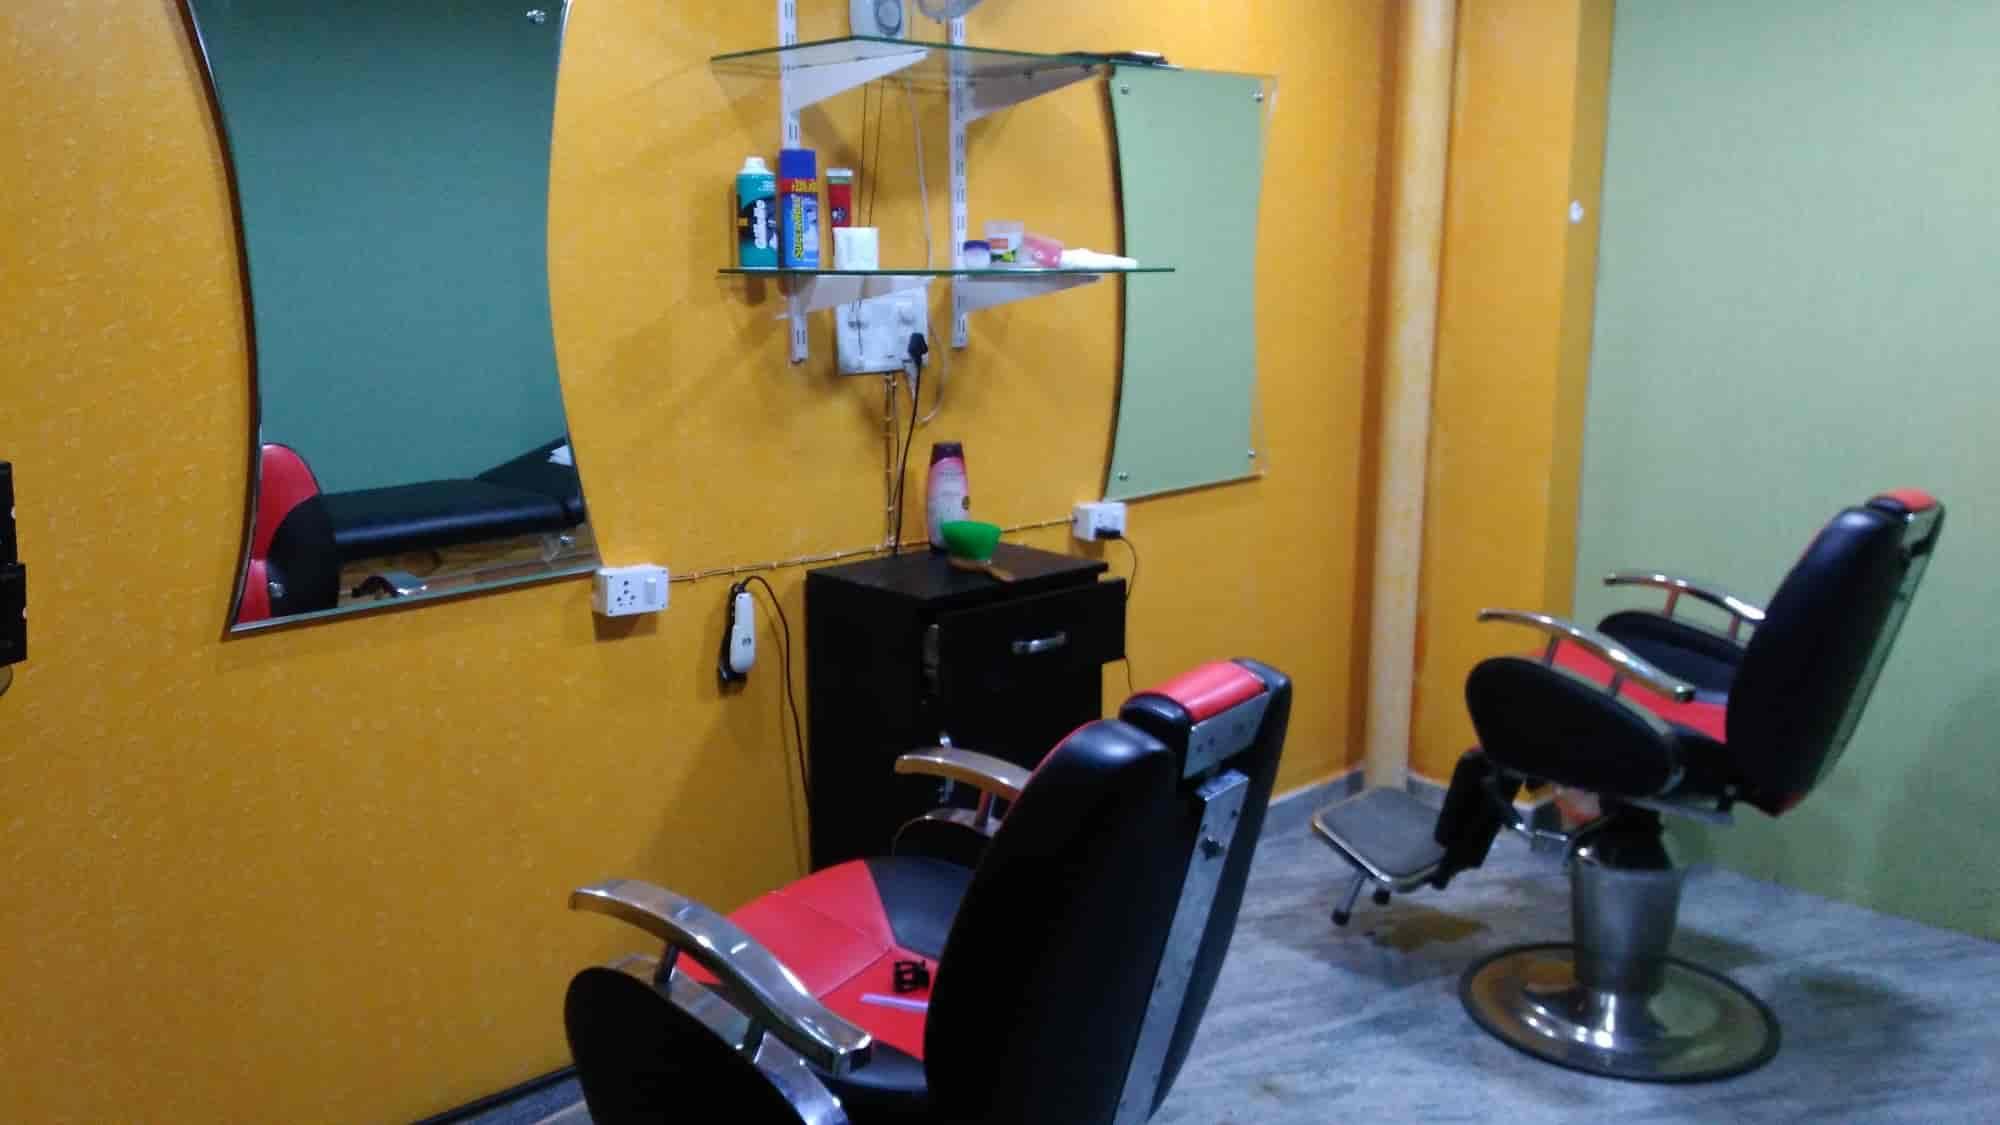 Panchakarma equipments suppliers in bangalore dating